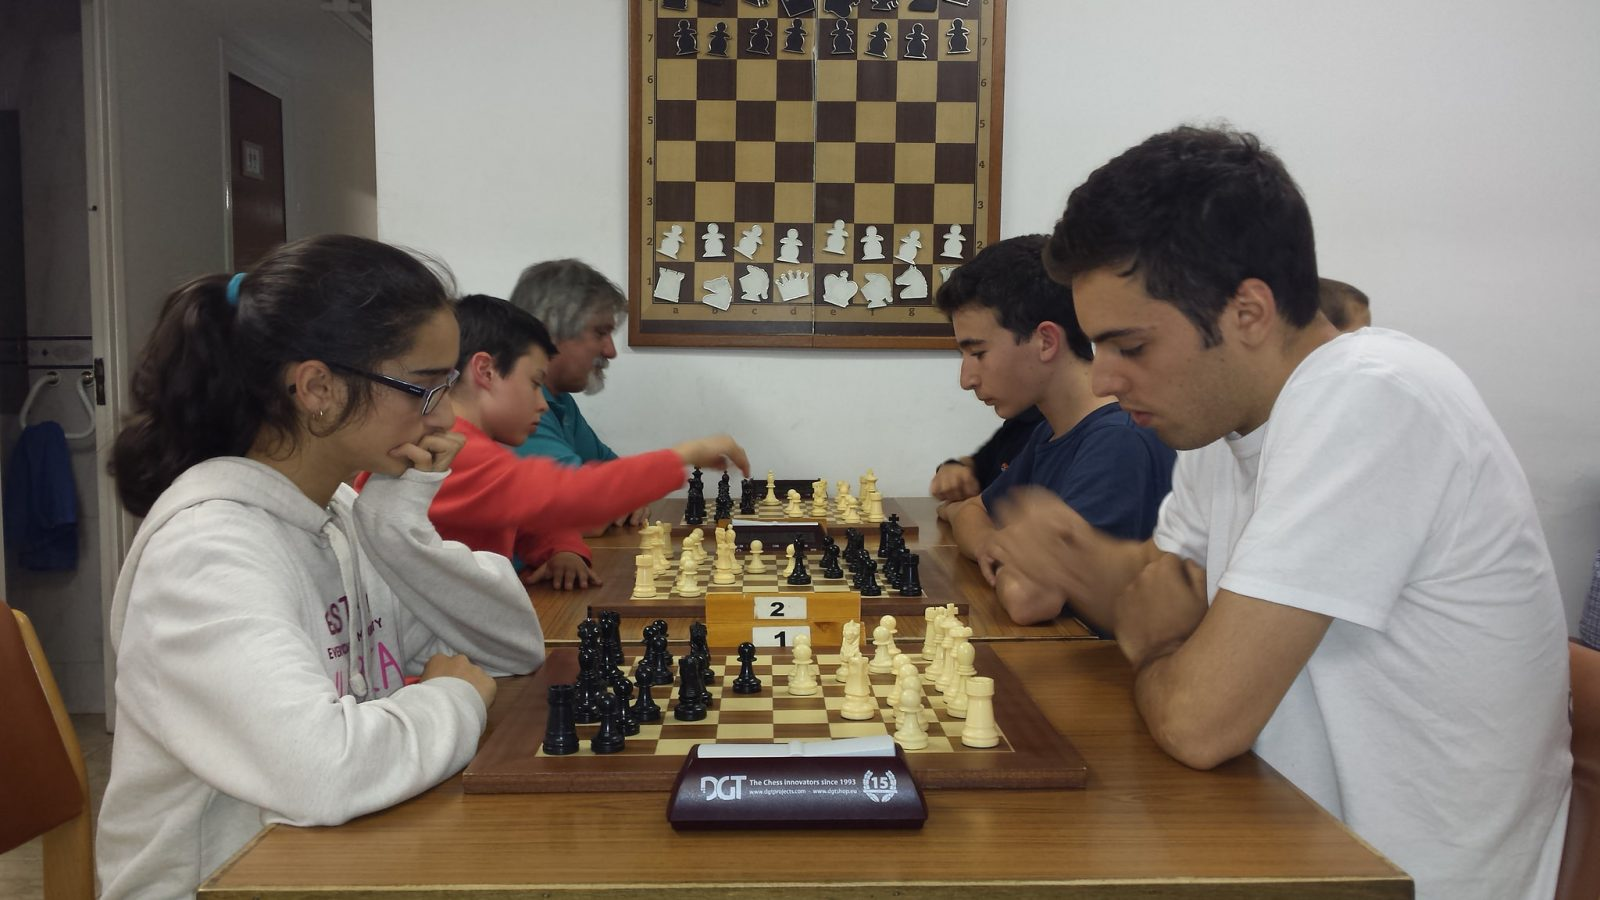 Campionat Social GEVA-CEA 2018 – Bases